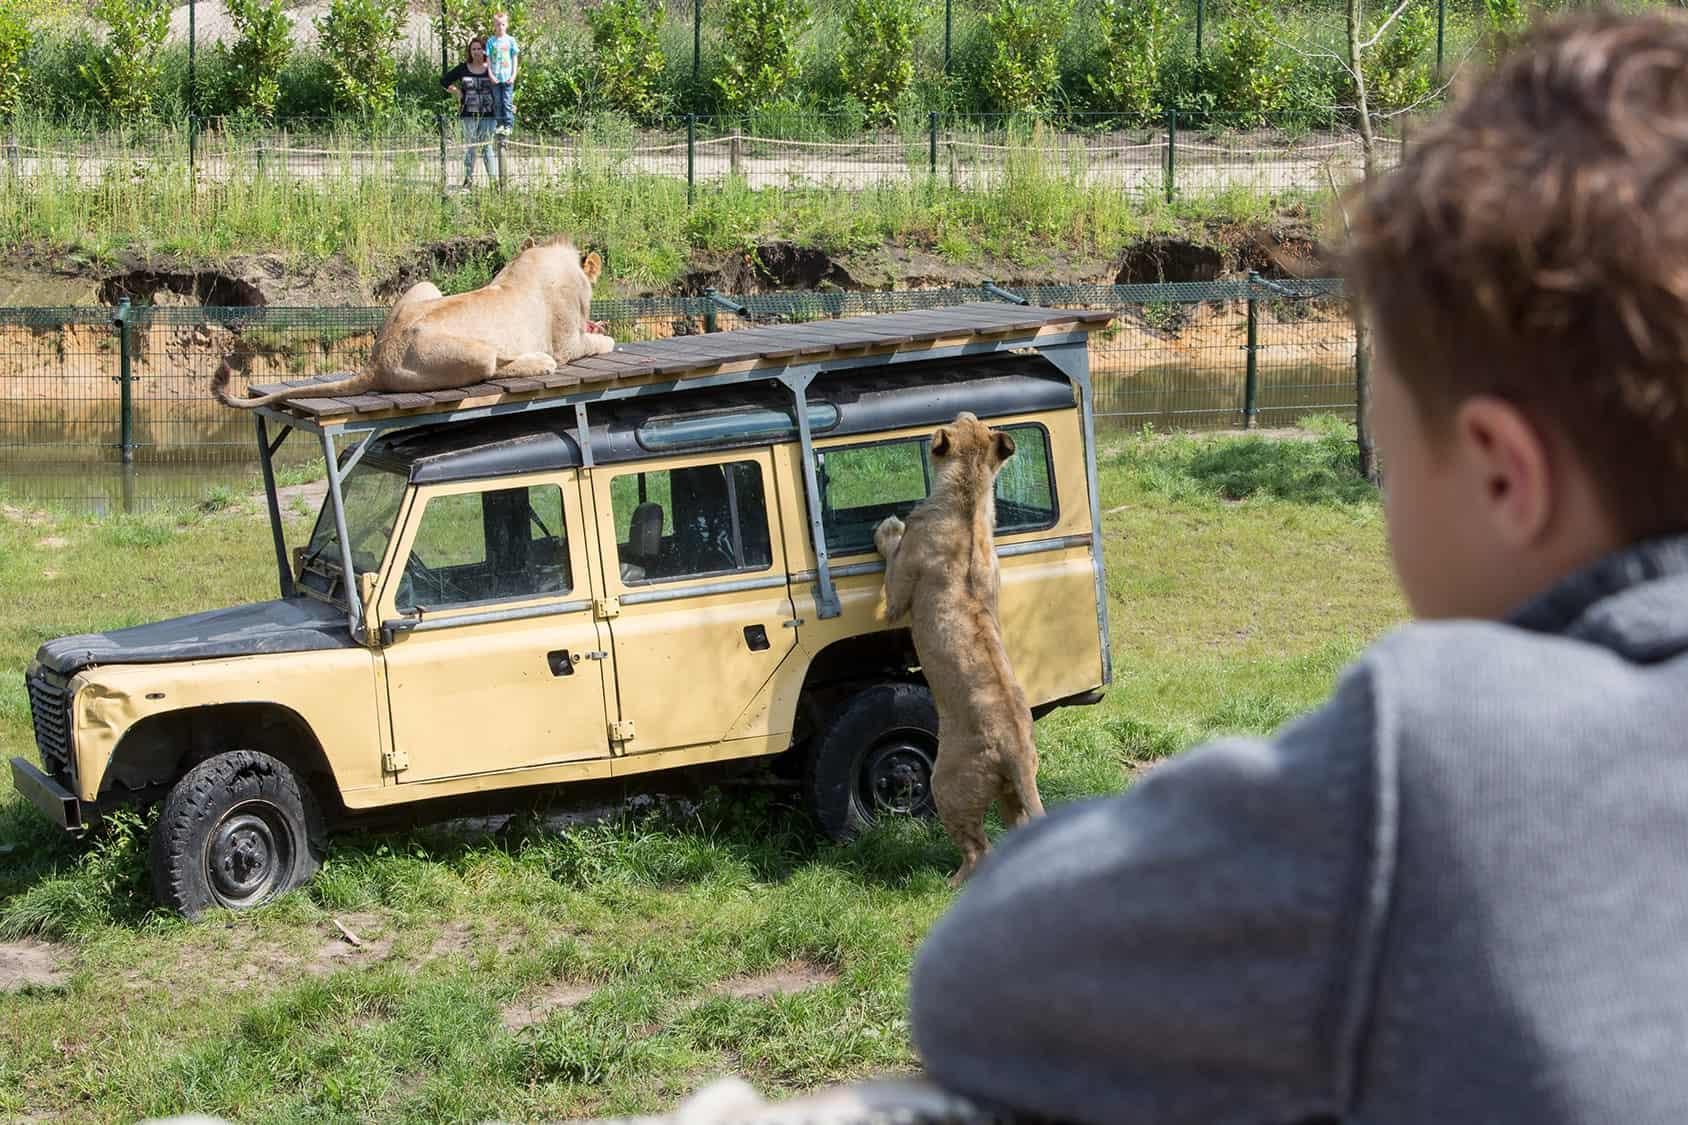 Leeuwen in ZooParc Overloon